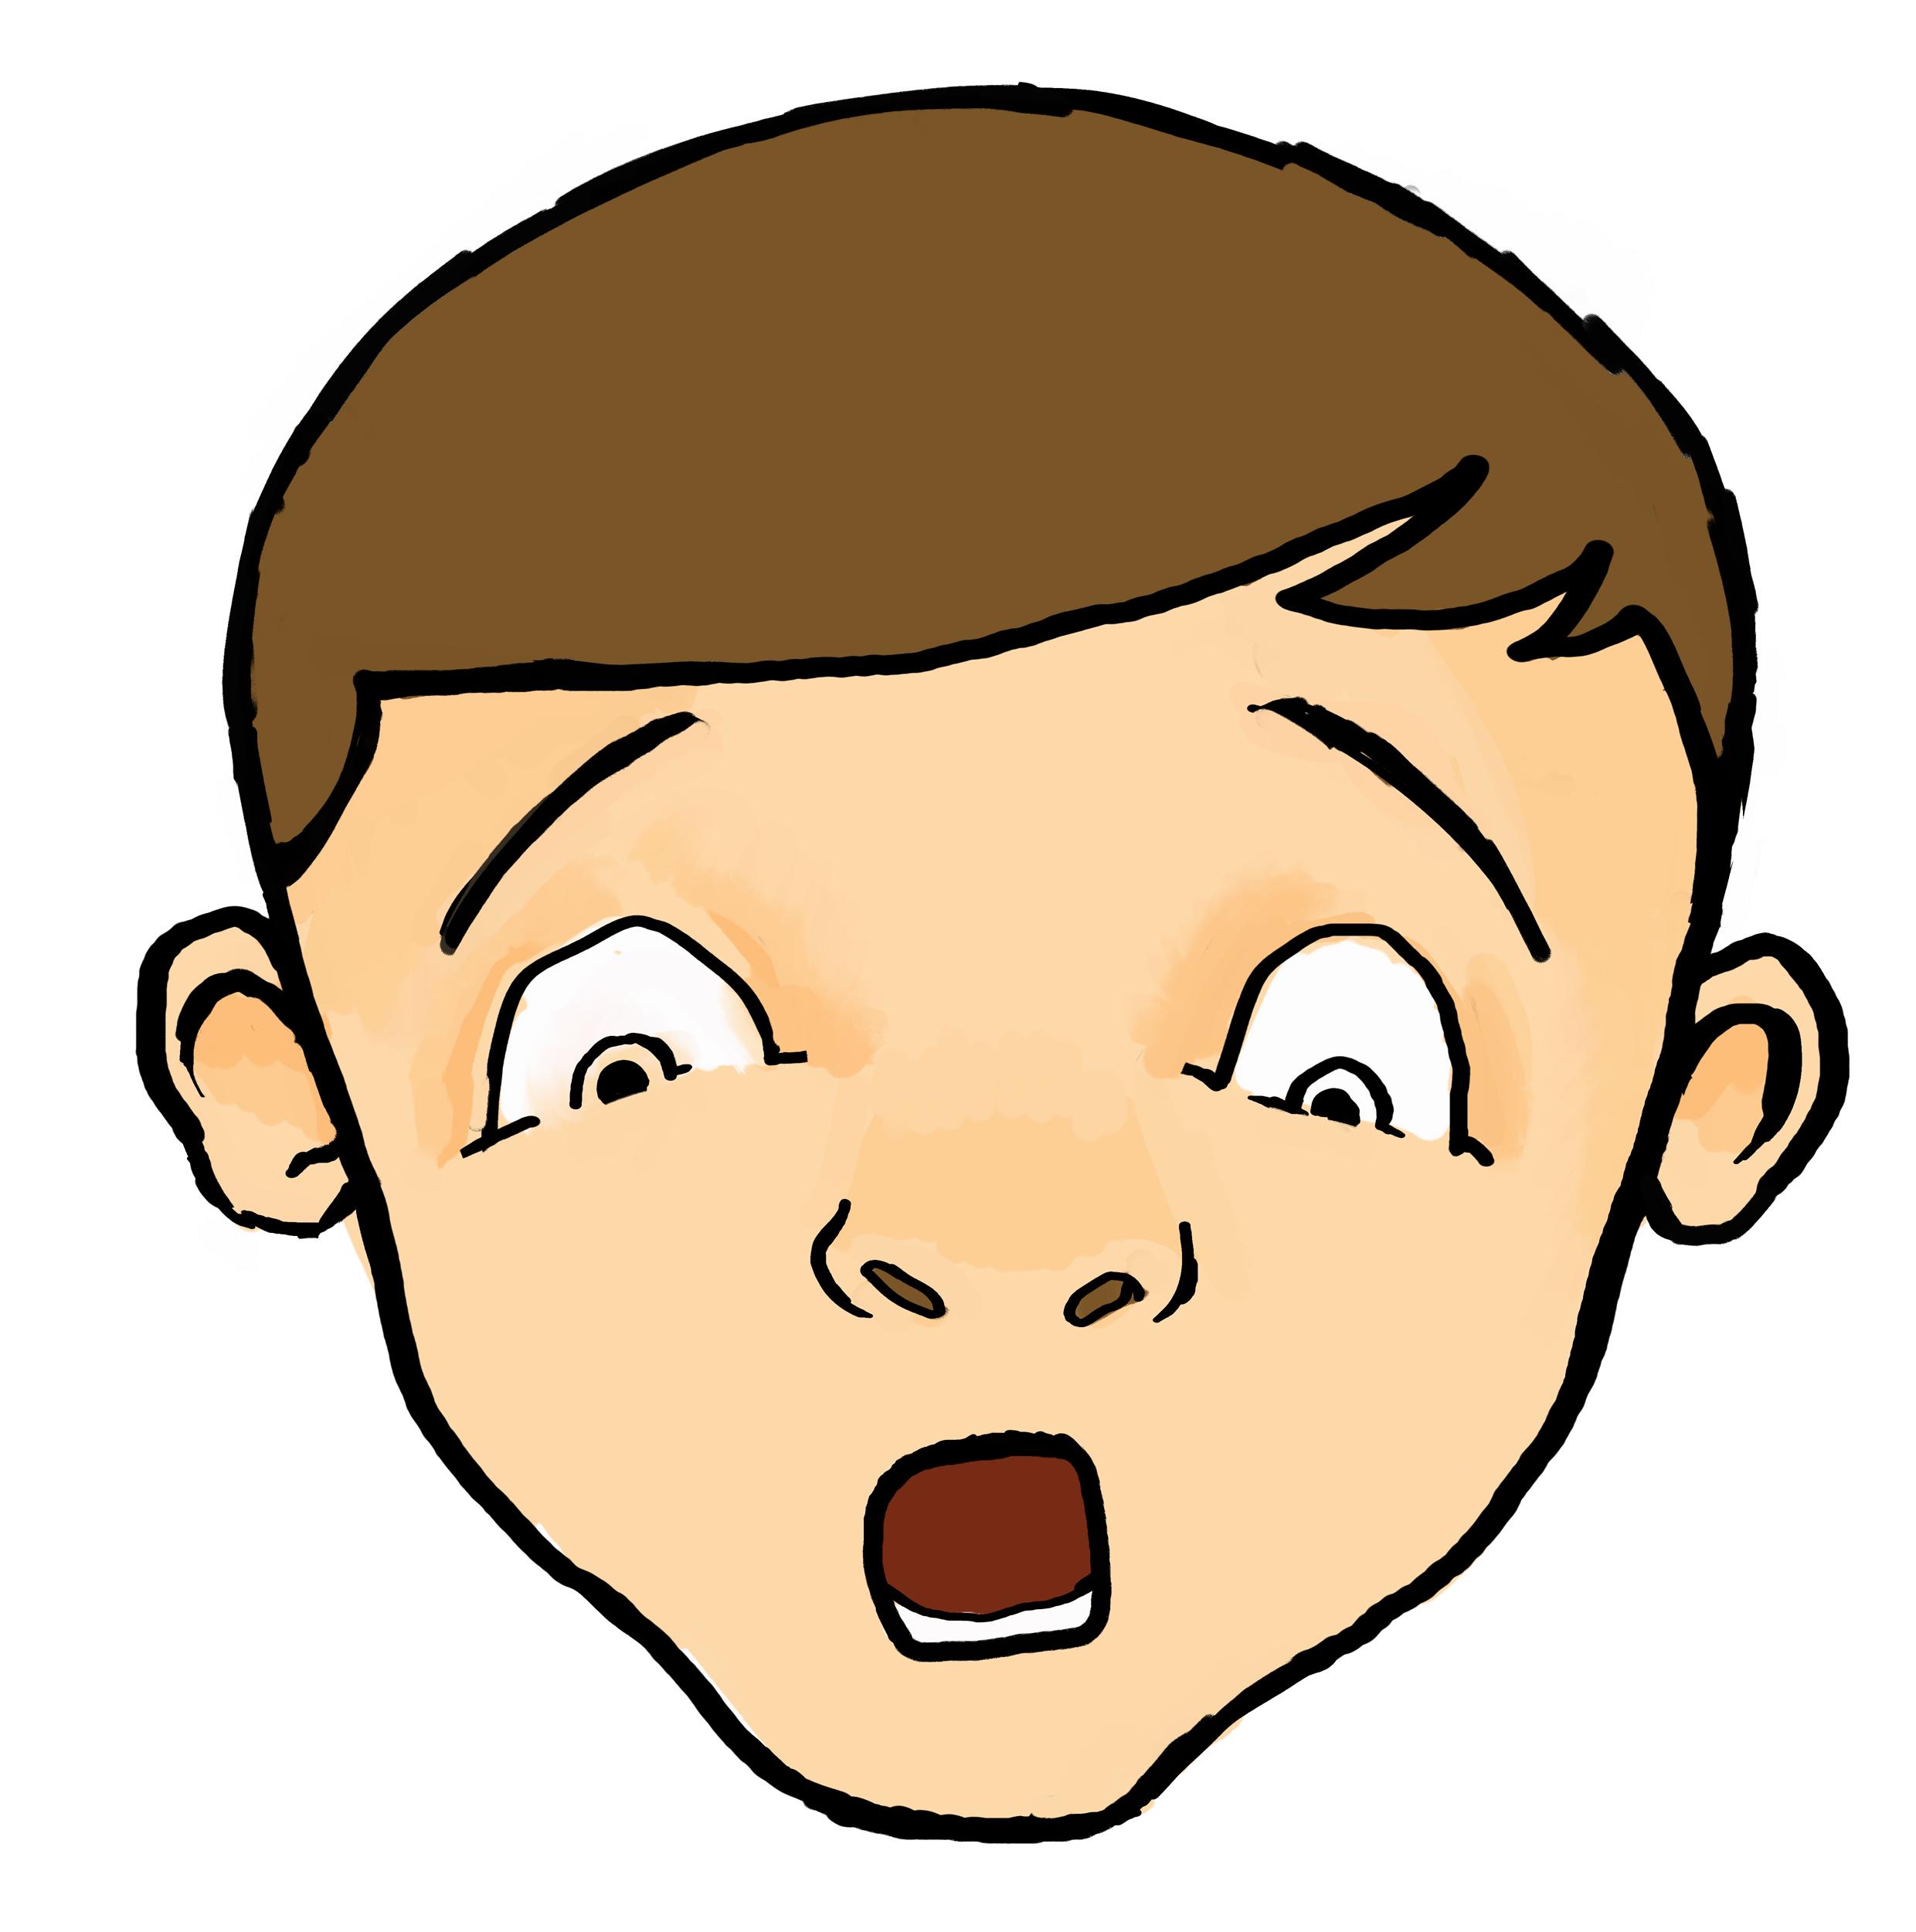 Clip Art Cartoon Faces Cliparts Co-Clip Art Cartoon Faces Cliparts Co-11